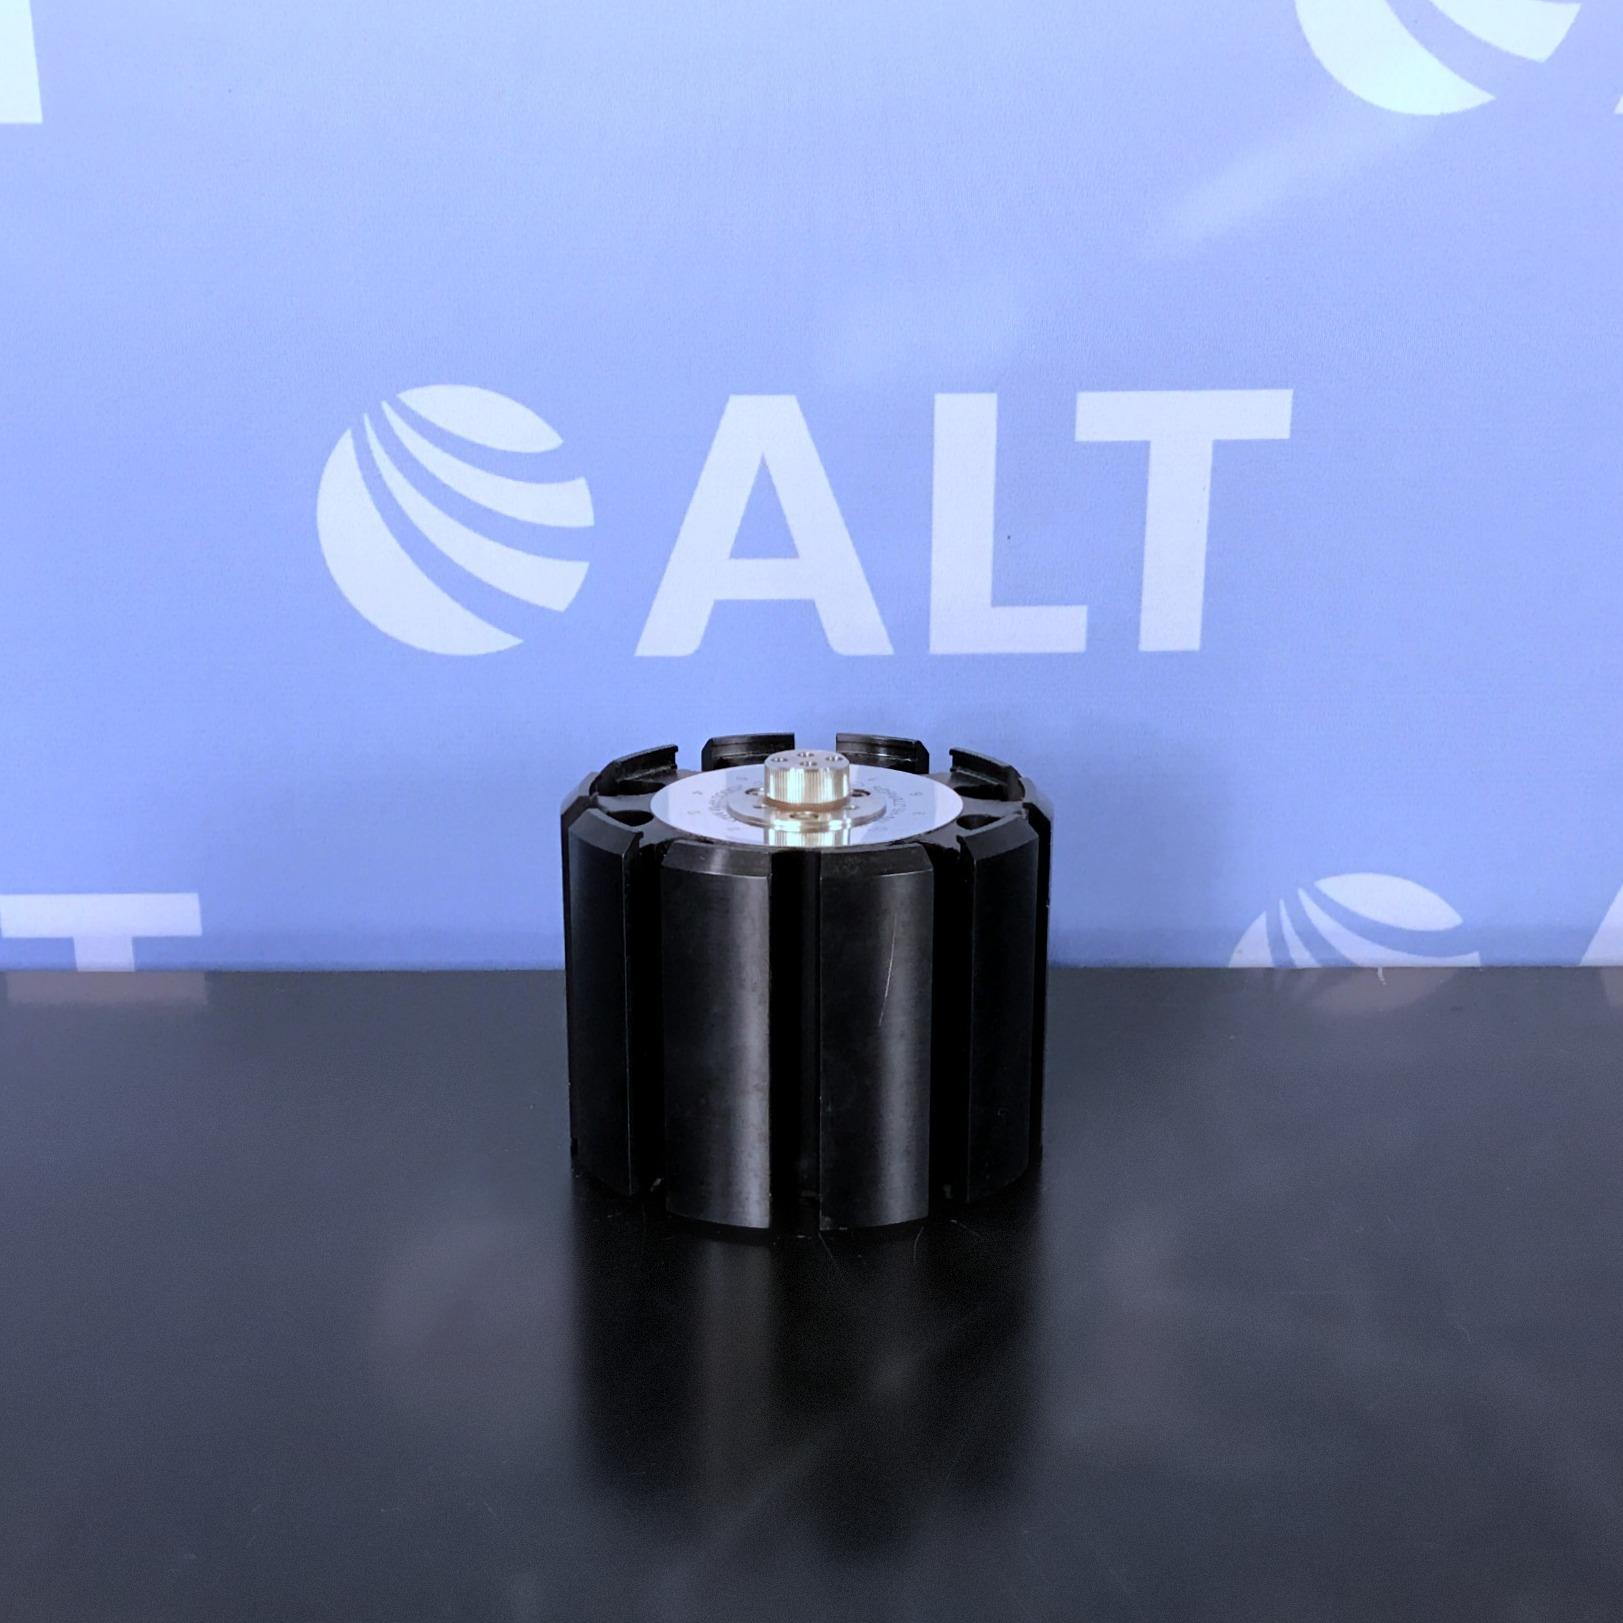 Sorvall SH-MT Aluminum  Microtube Rotor Image